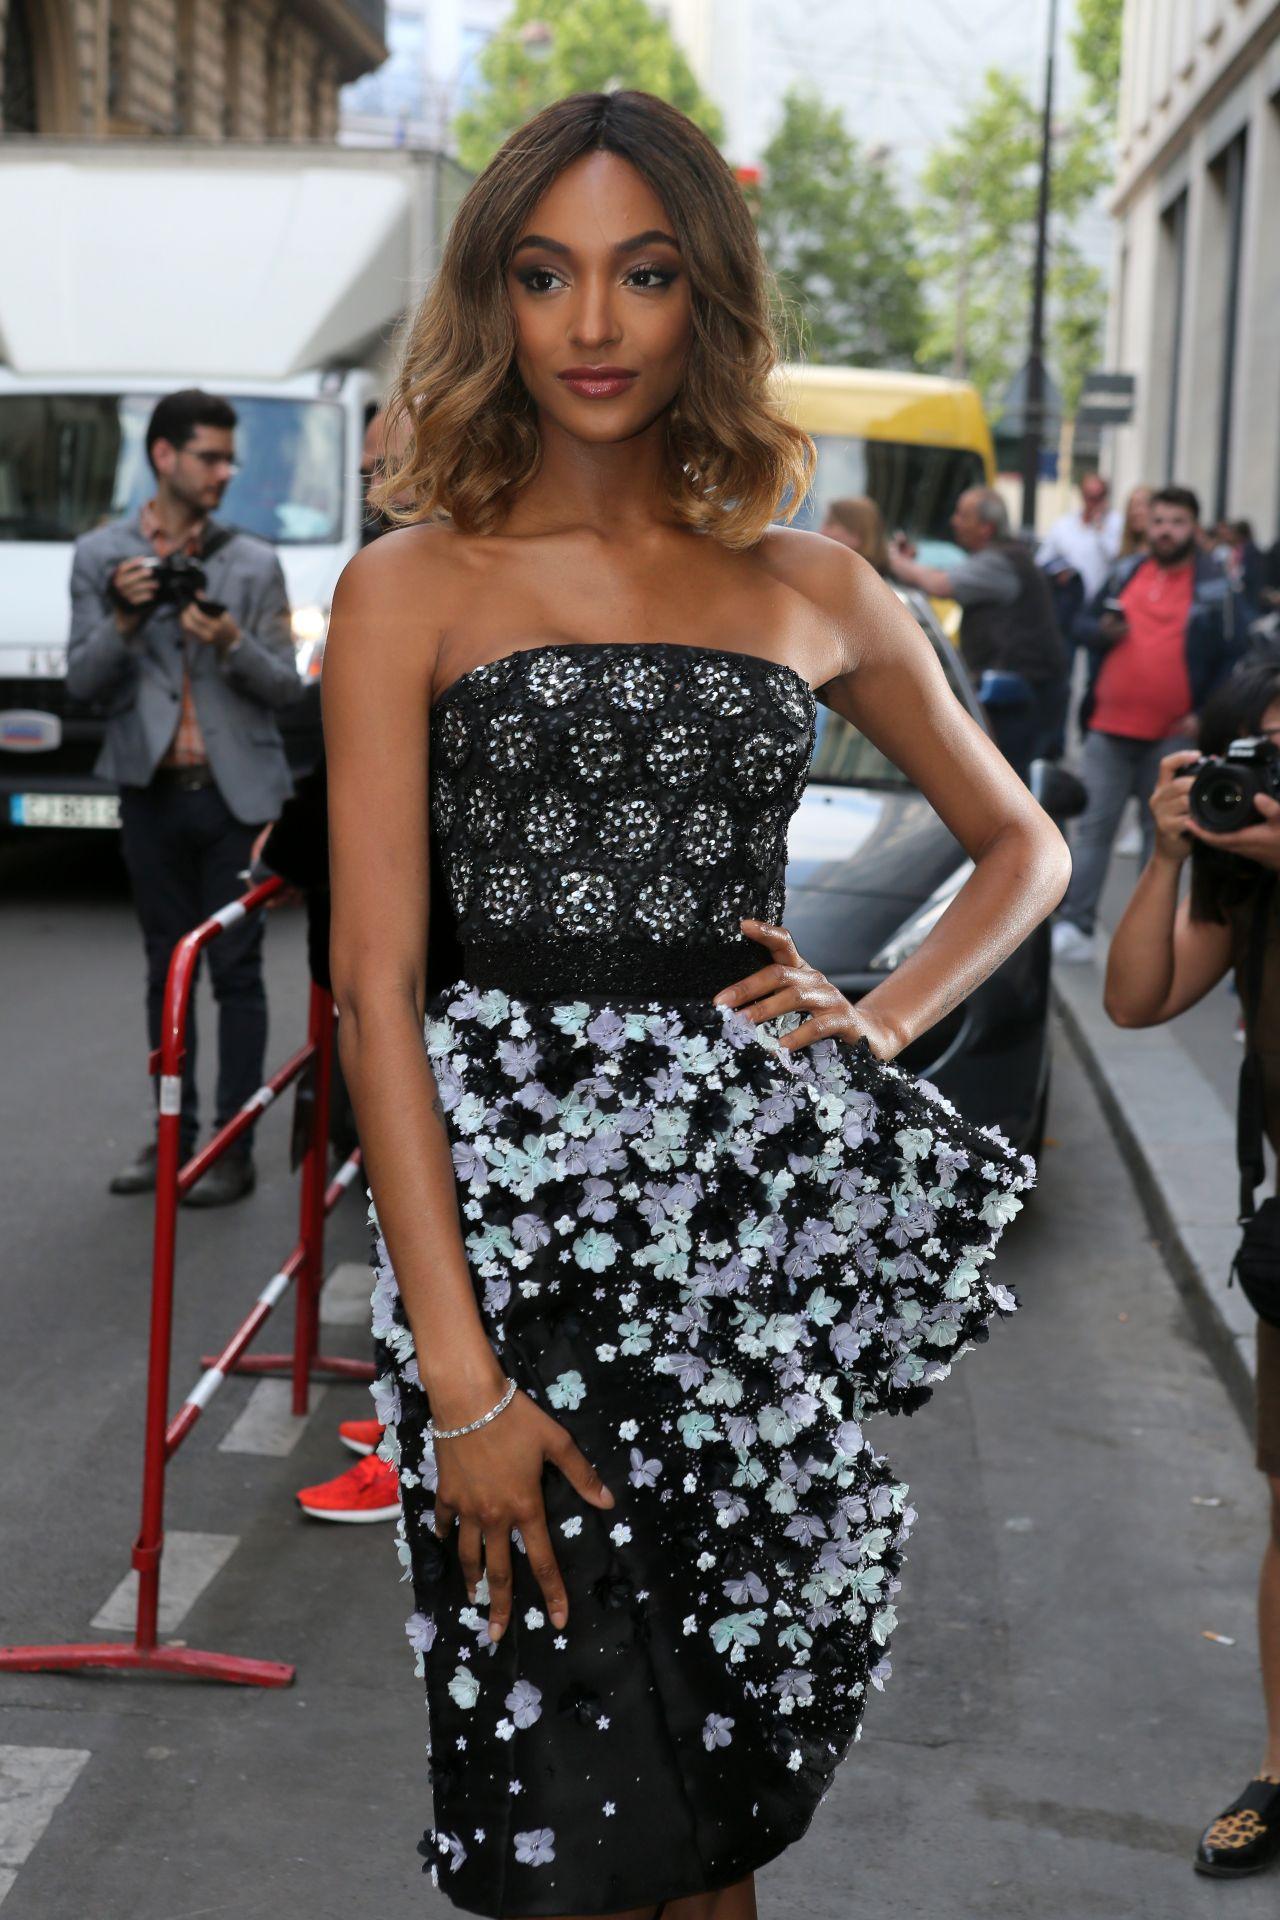 Wallpaper Jourdan Dunn Top Fashion Models 2015 Model: Jourdan Dunn Photo 180 Of 276 Pics, Wallpaper